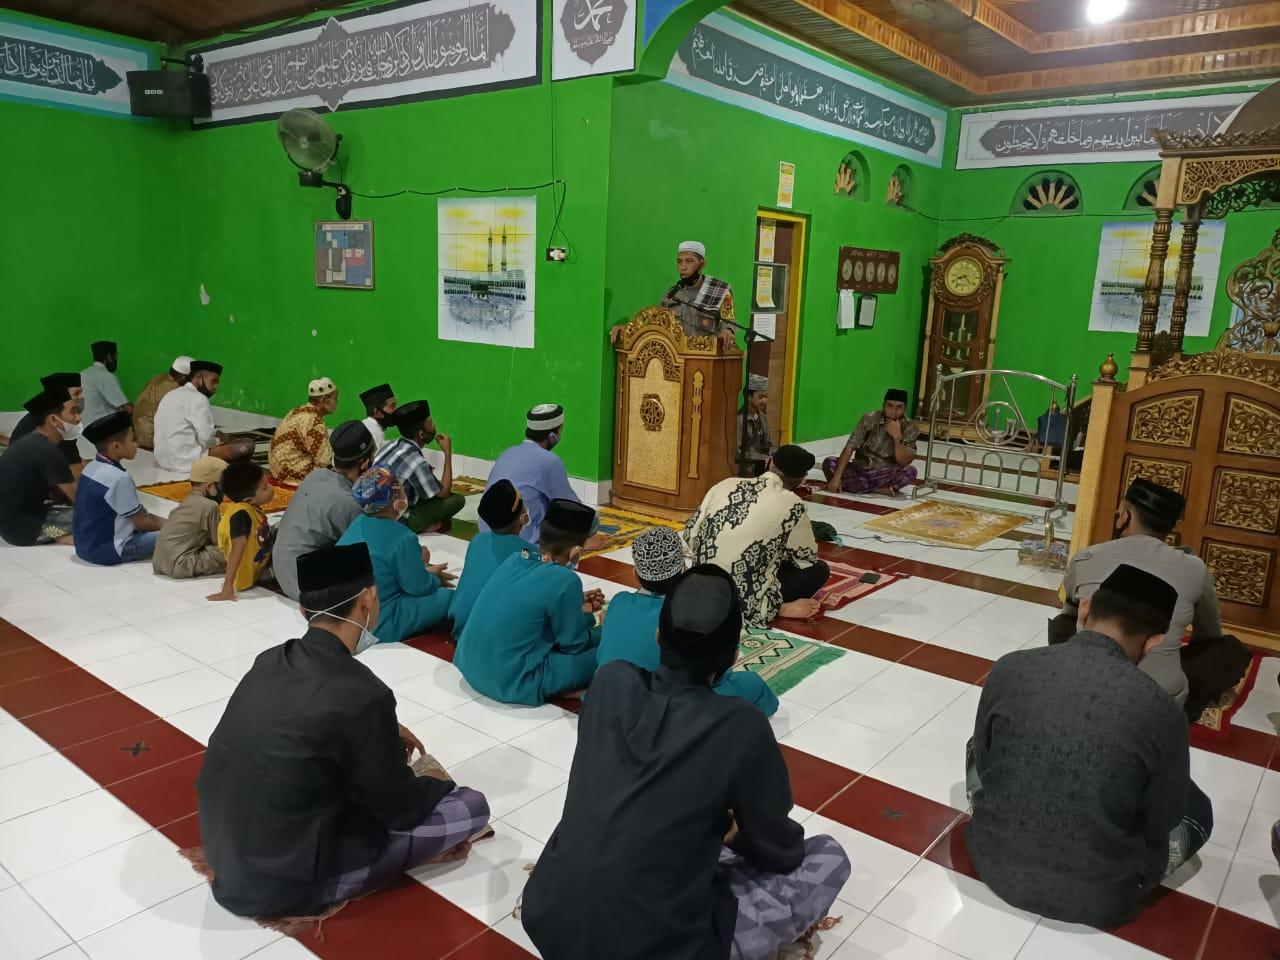 Ceramah di Masjid Jami Babussalam Desa Baringeng Kapolsek Lilirilau Ajak Warga Jaga Kamtibmas